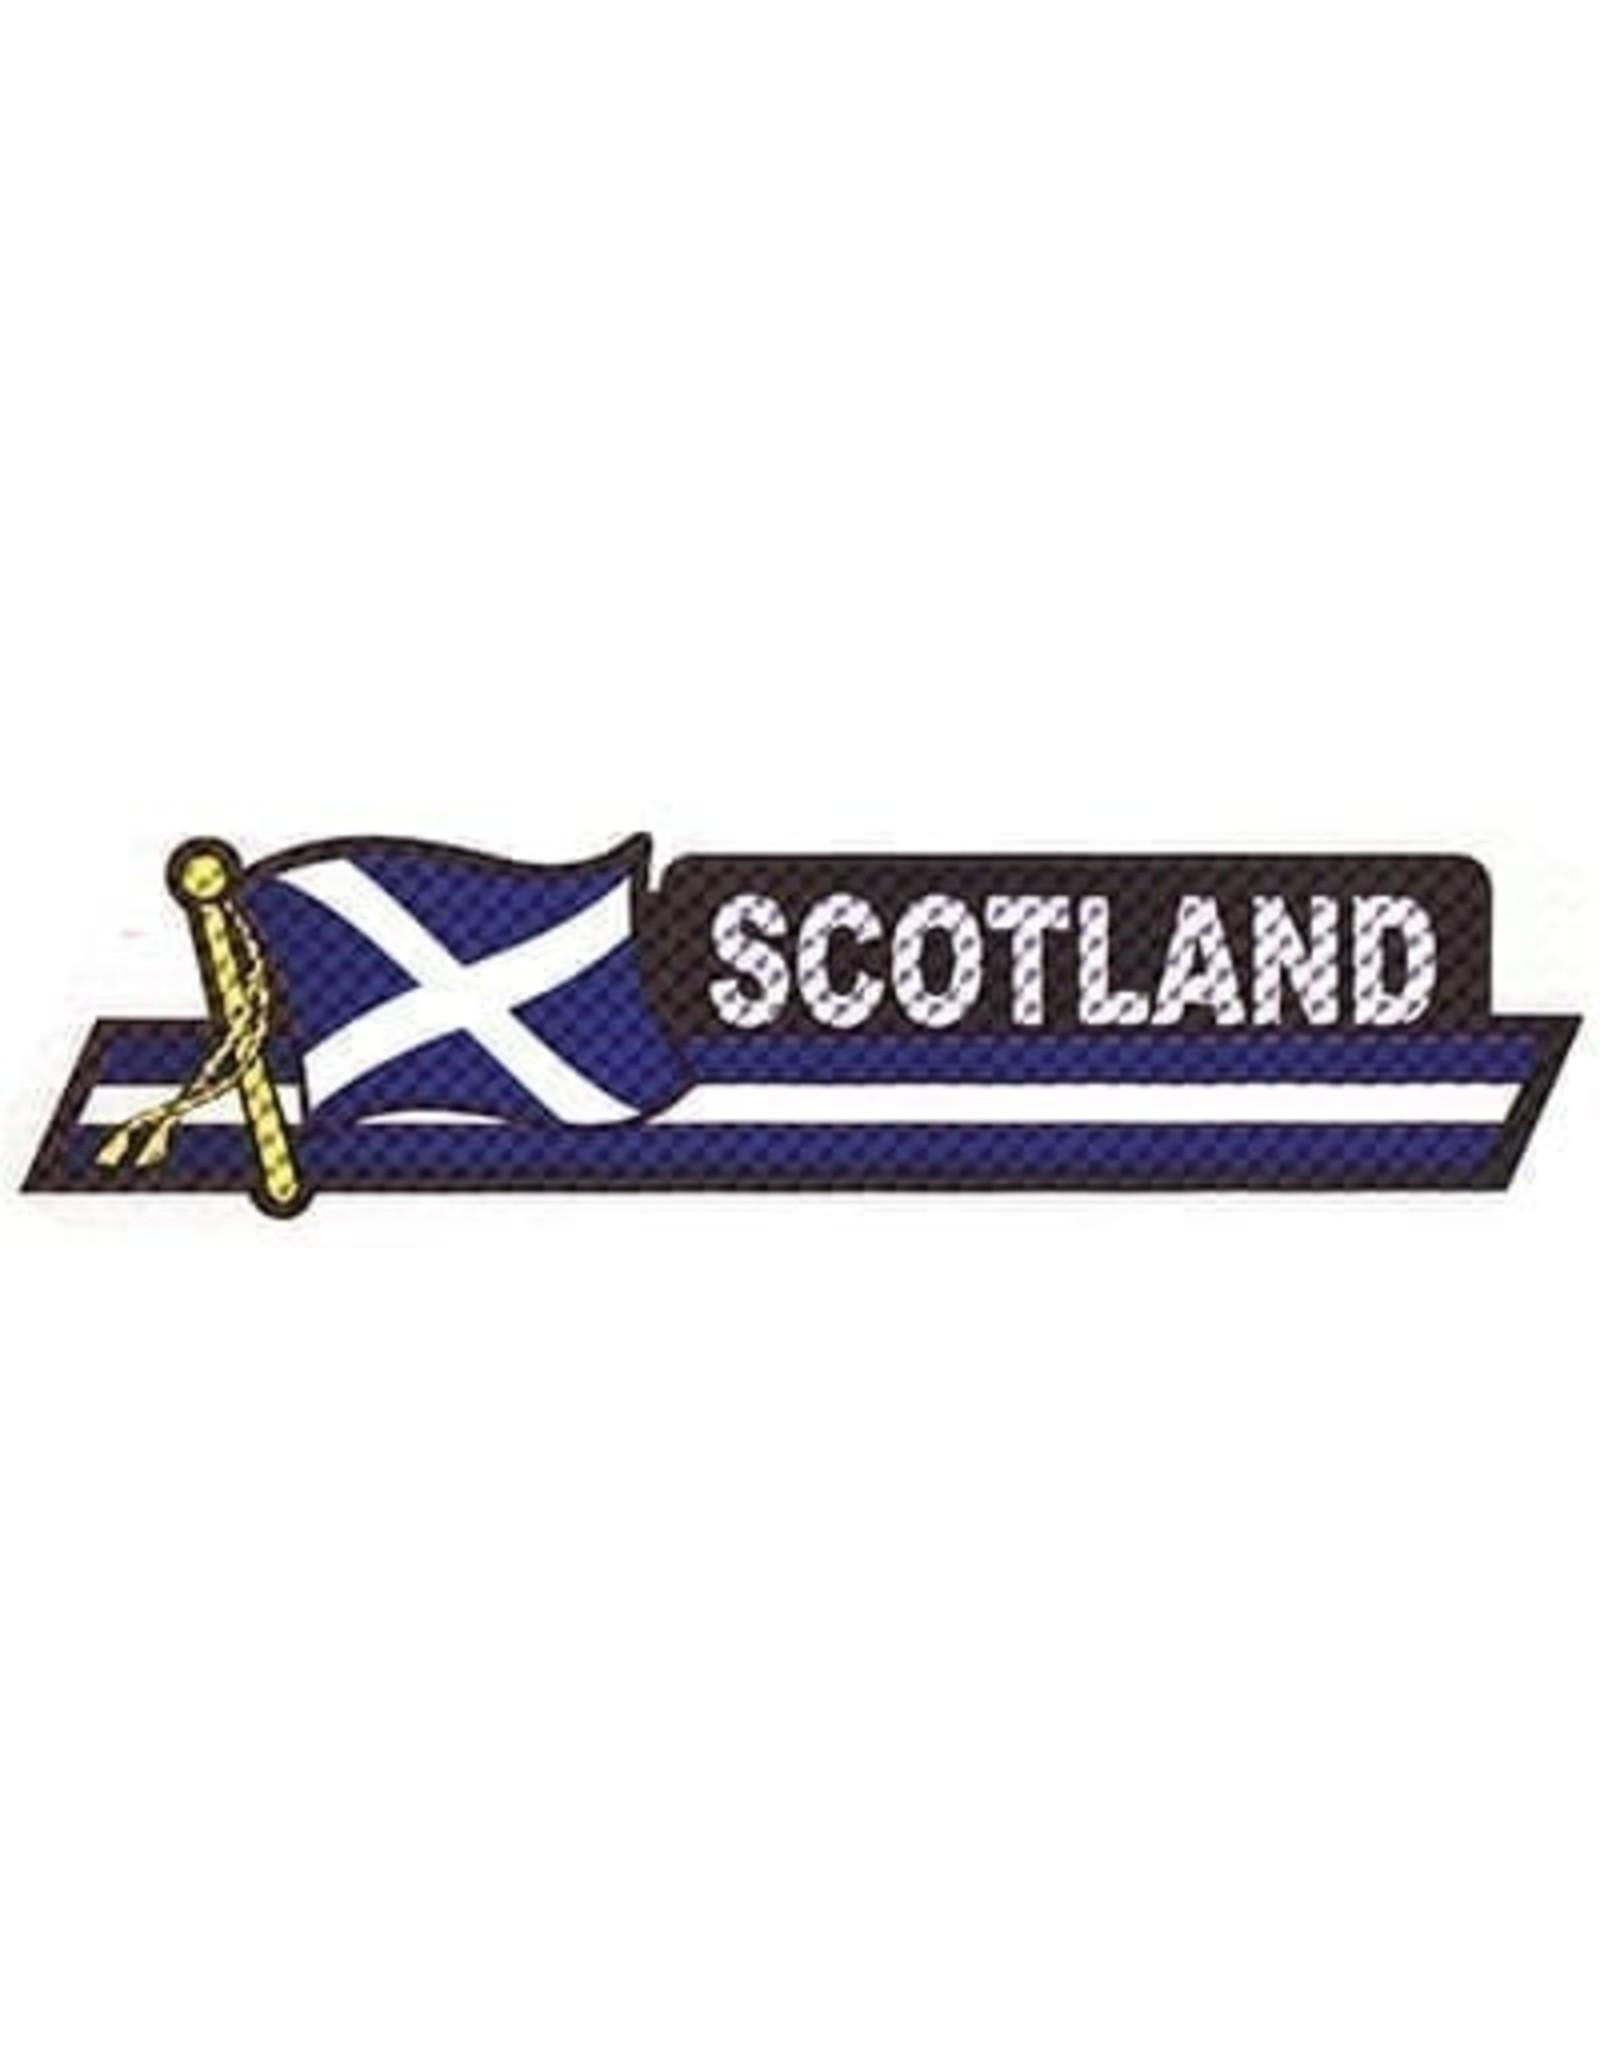 Scott's Highland Prism Decal